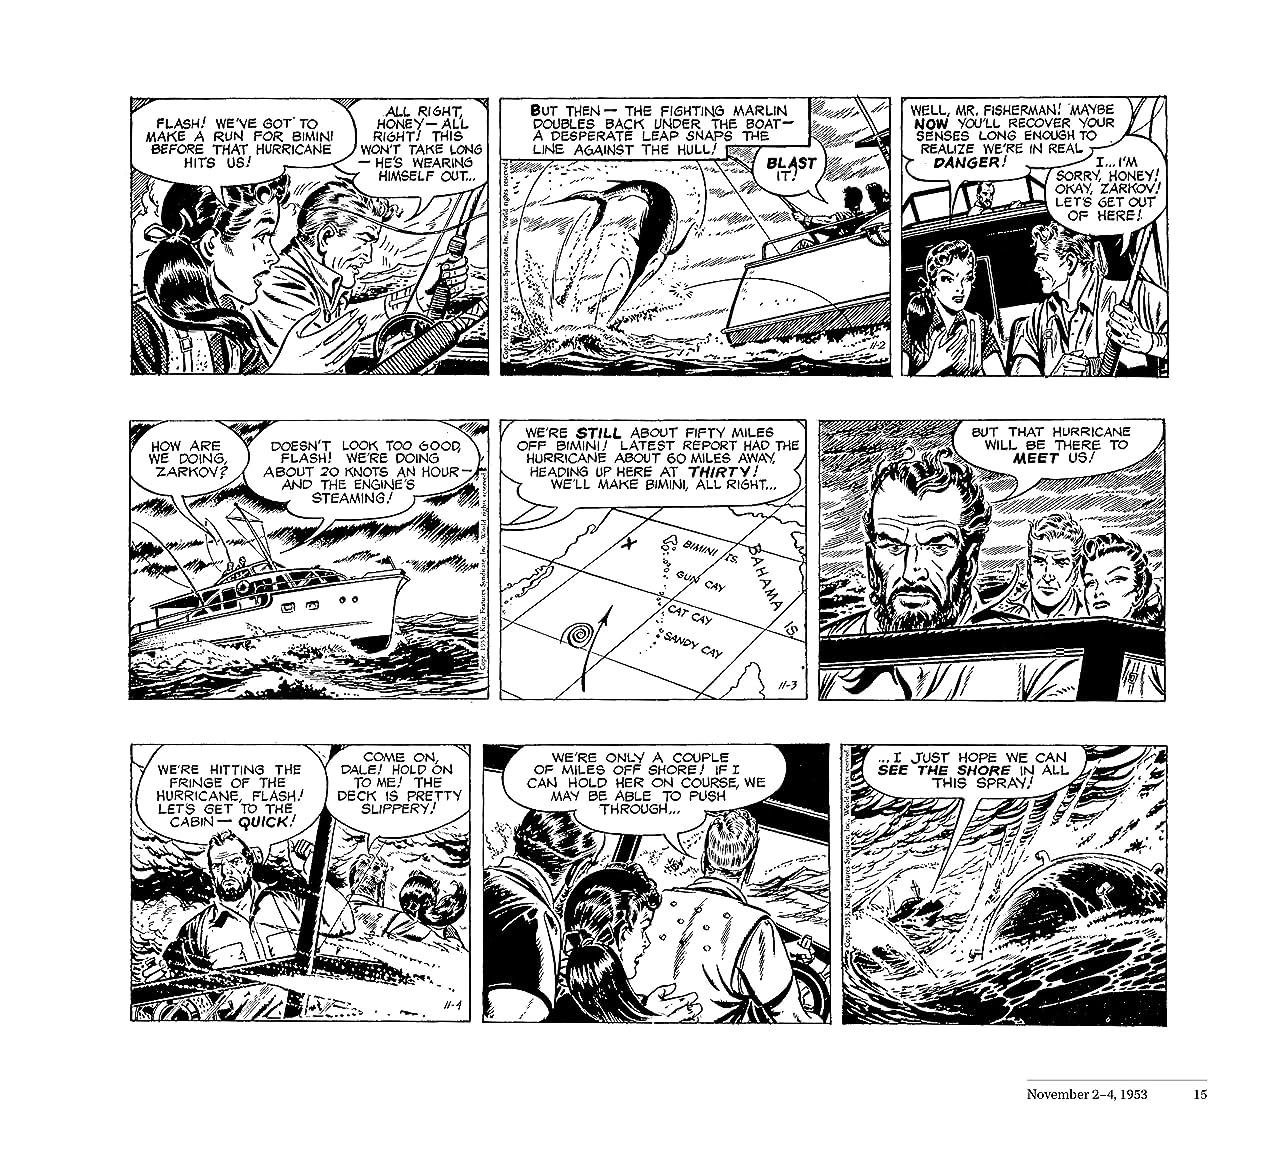 Flash Gordon: Dan Barry Vol. 2: The Lost Continent